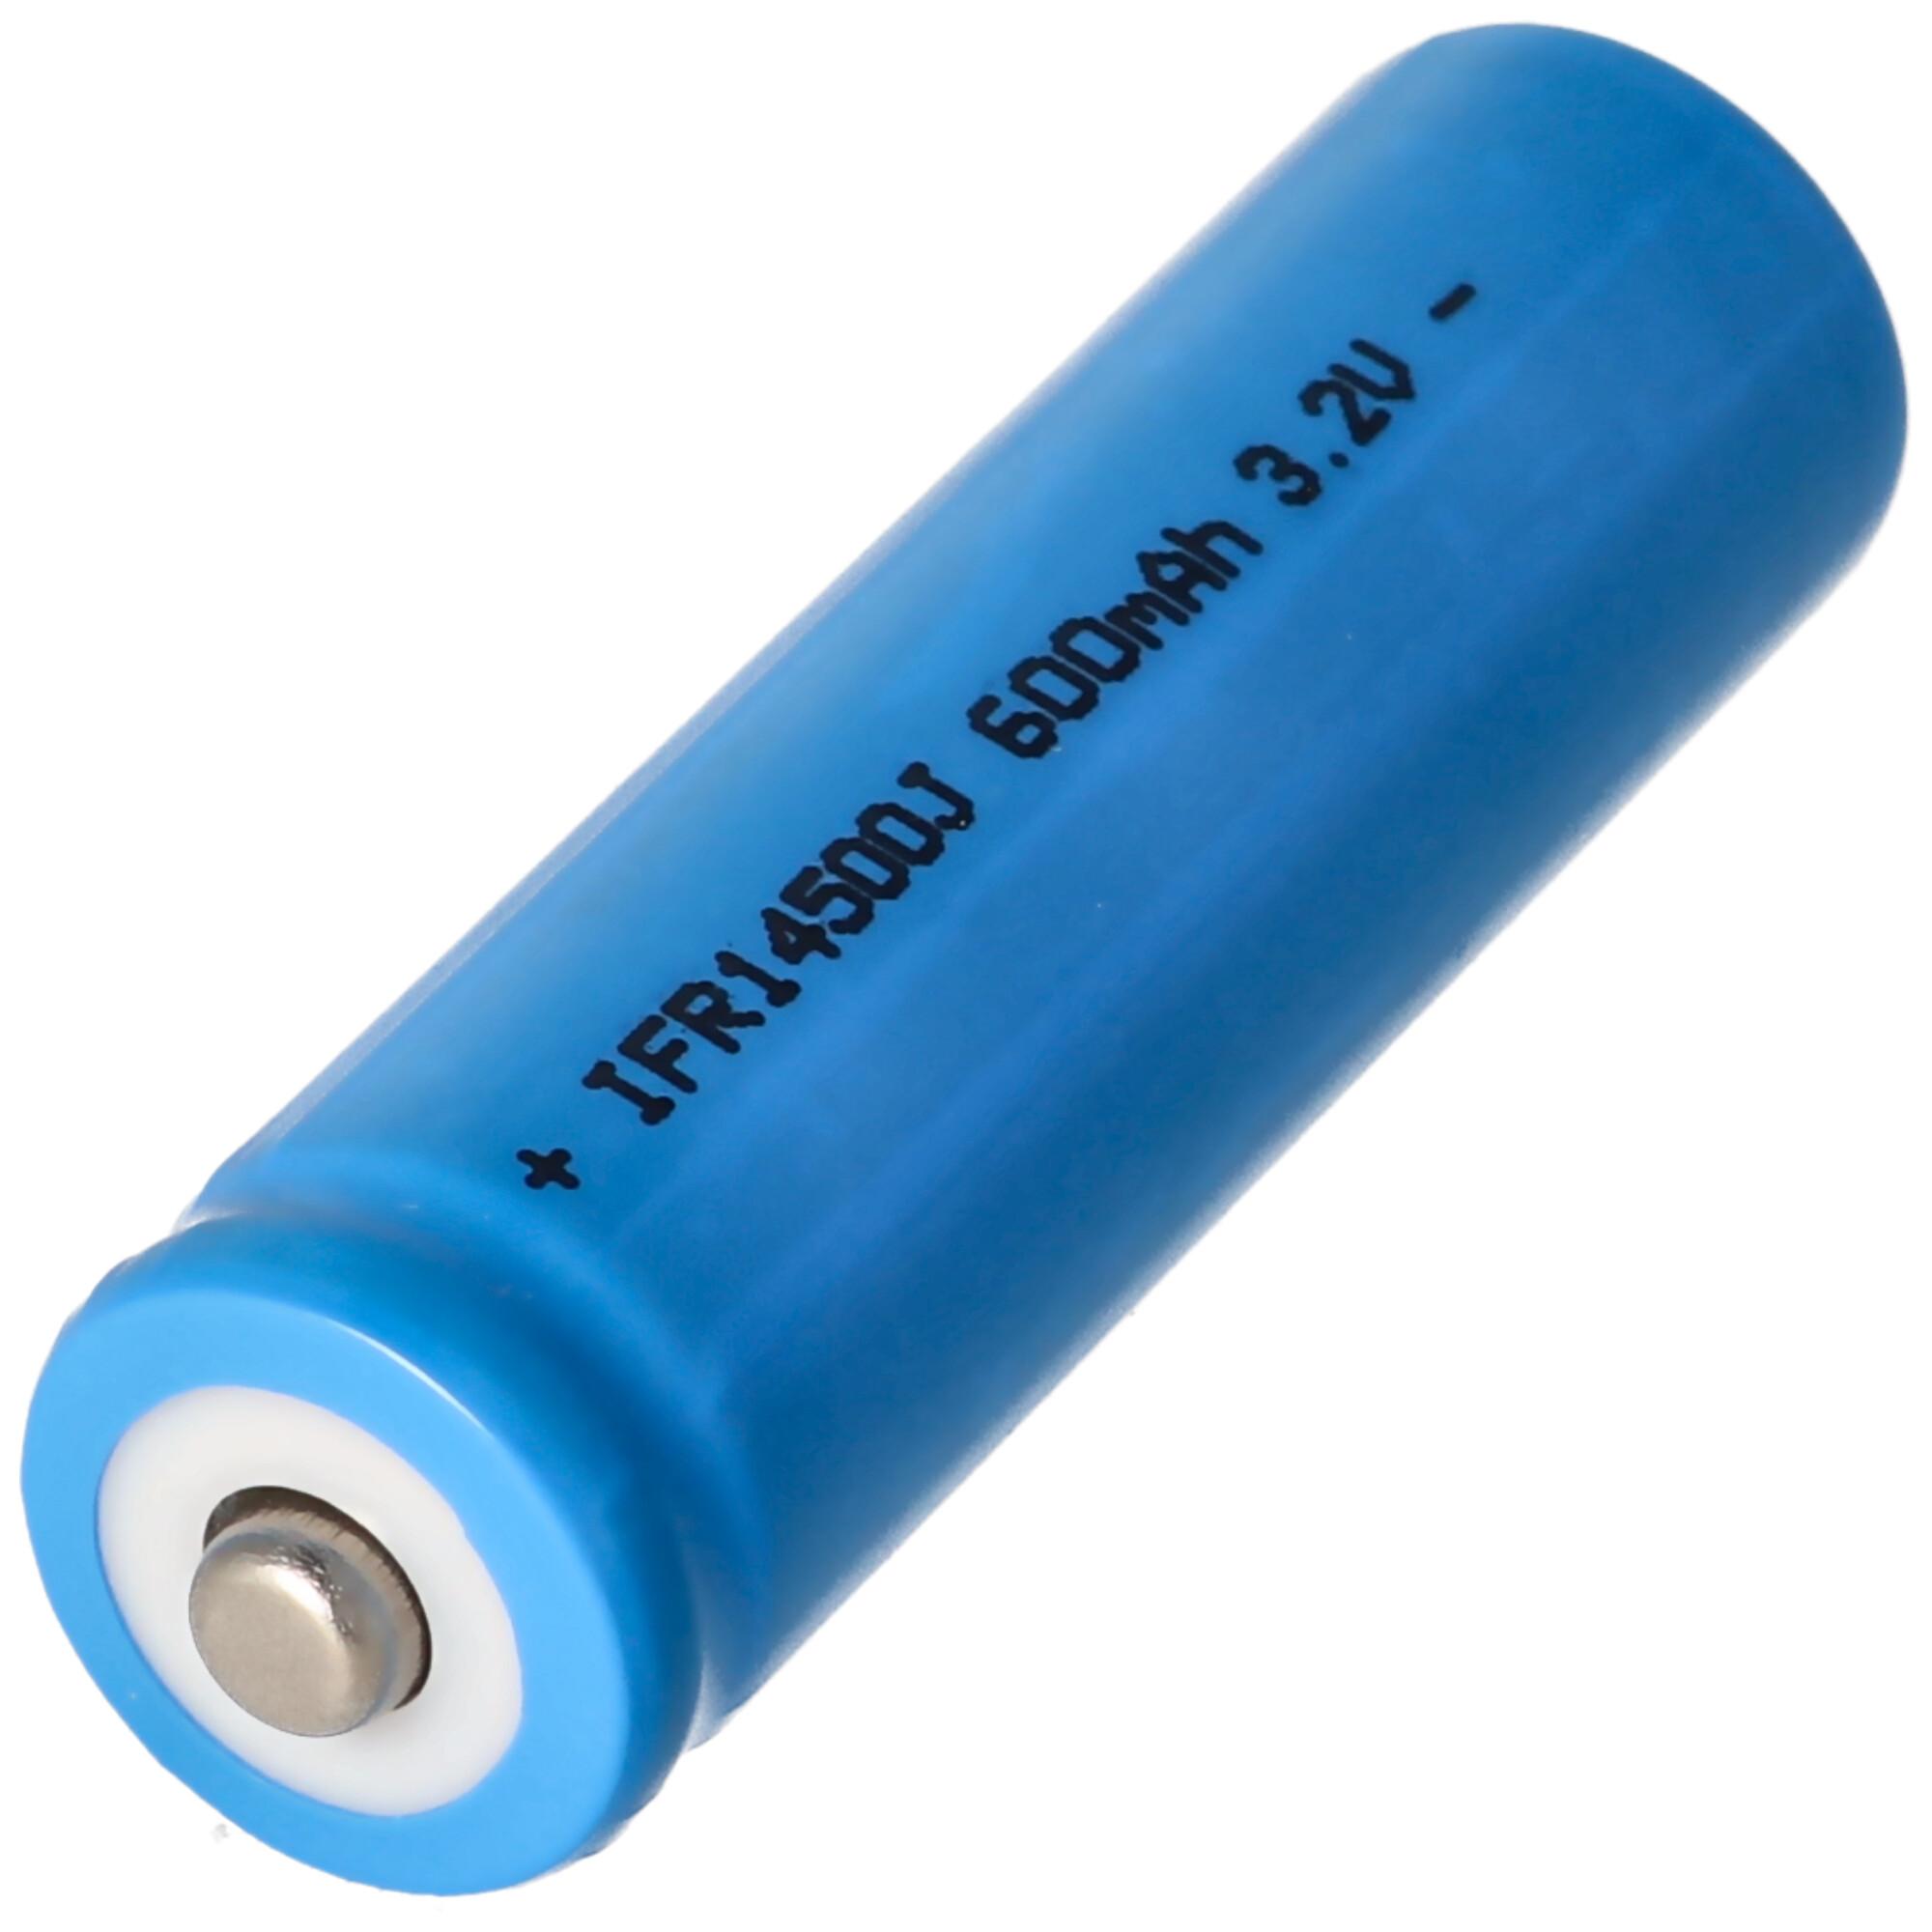 3,2 Volt Solar Akku Lithium IFR 14500 AA 600mAh LiFePo4 Akku